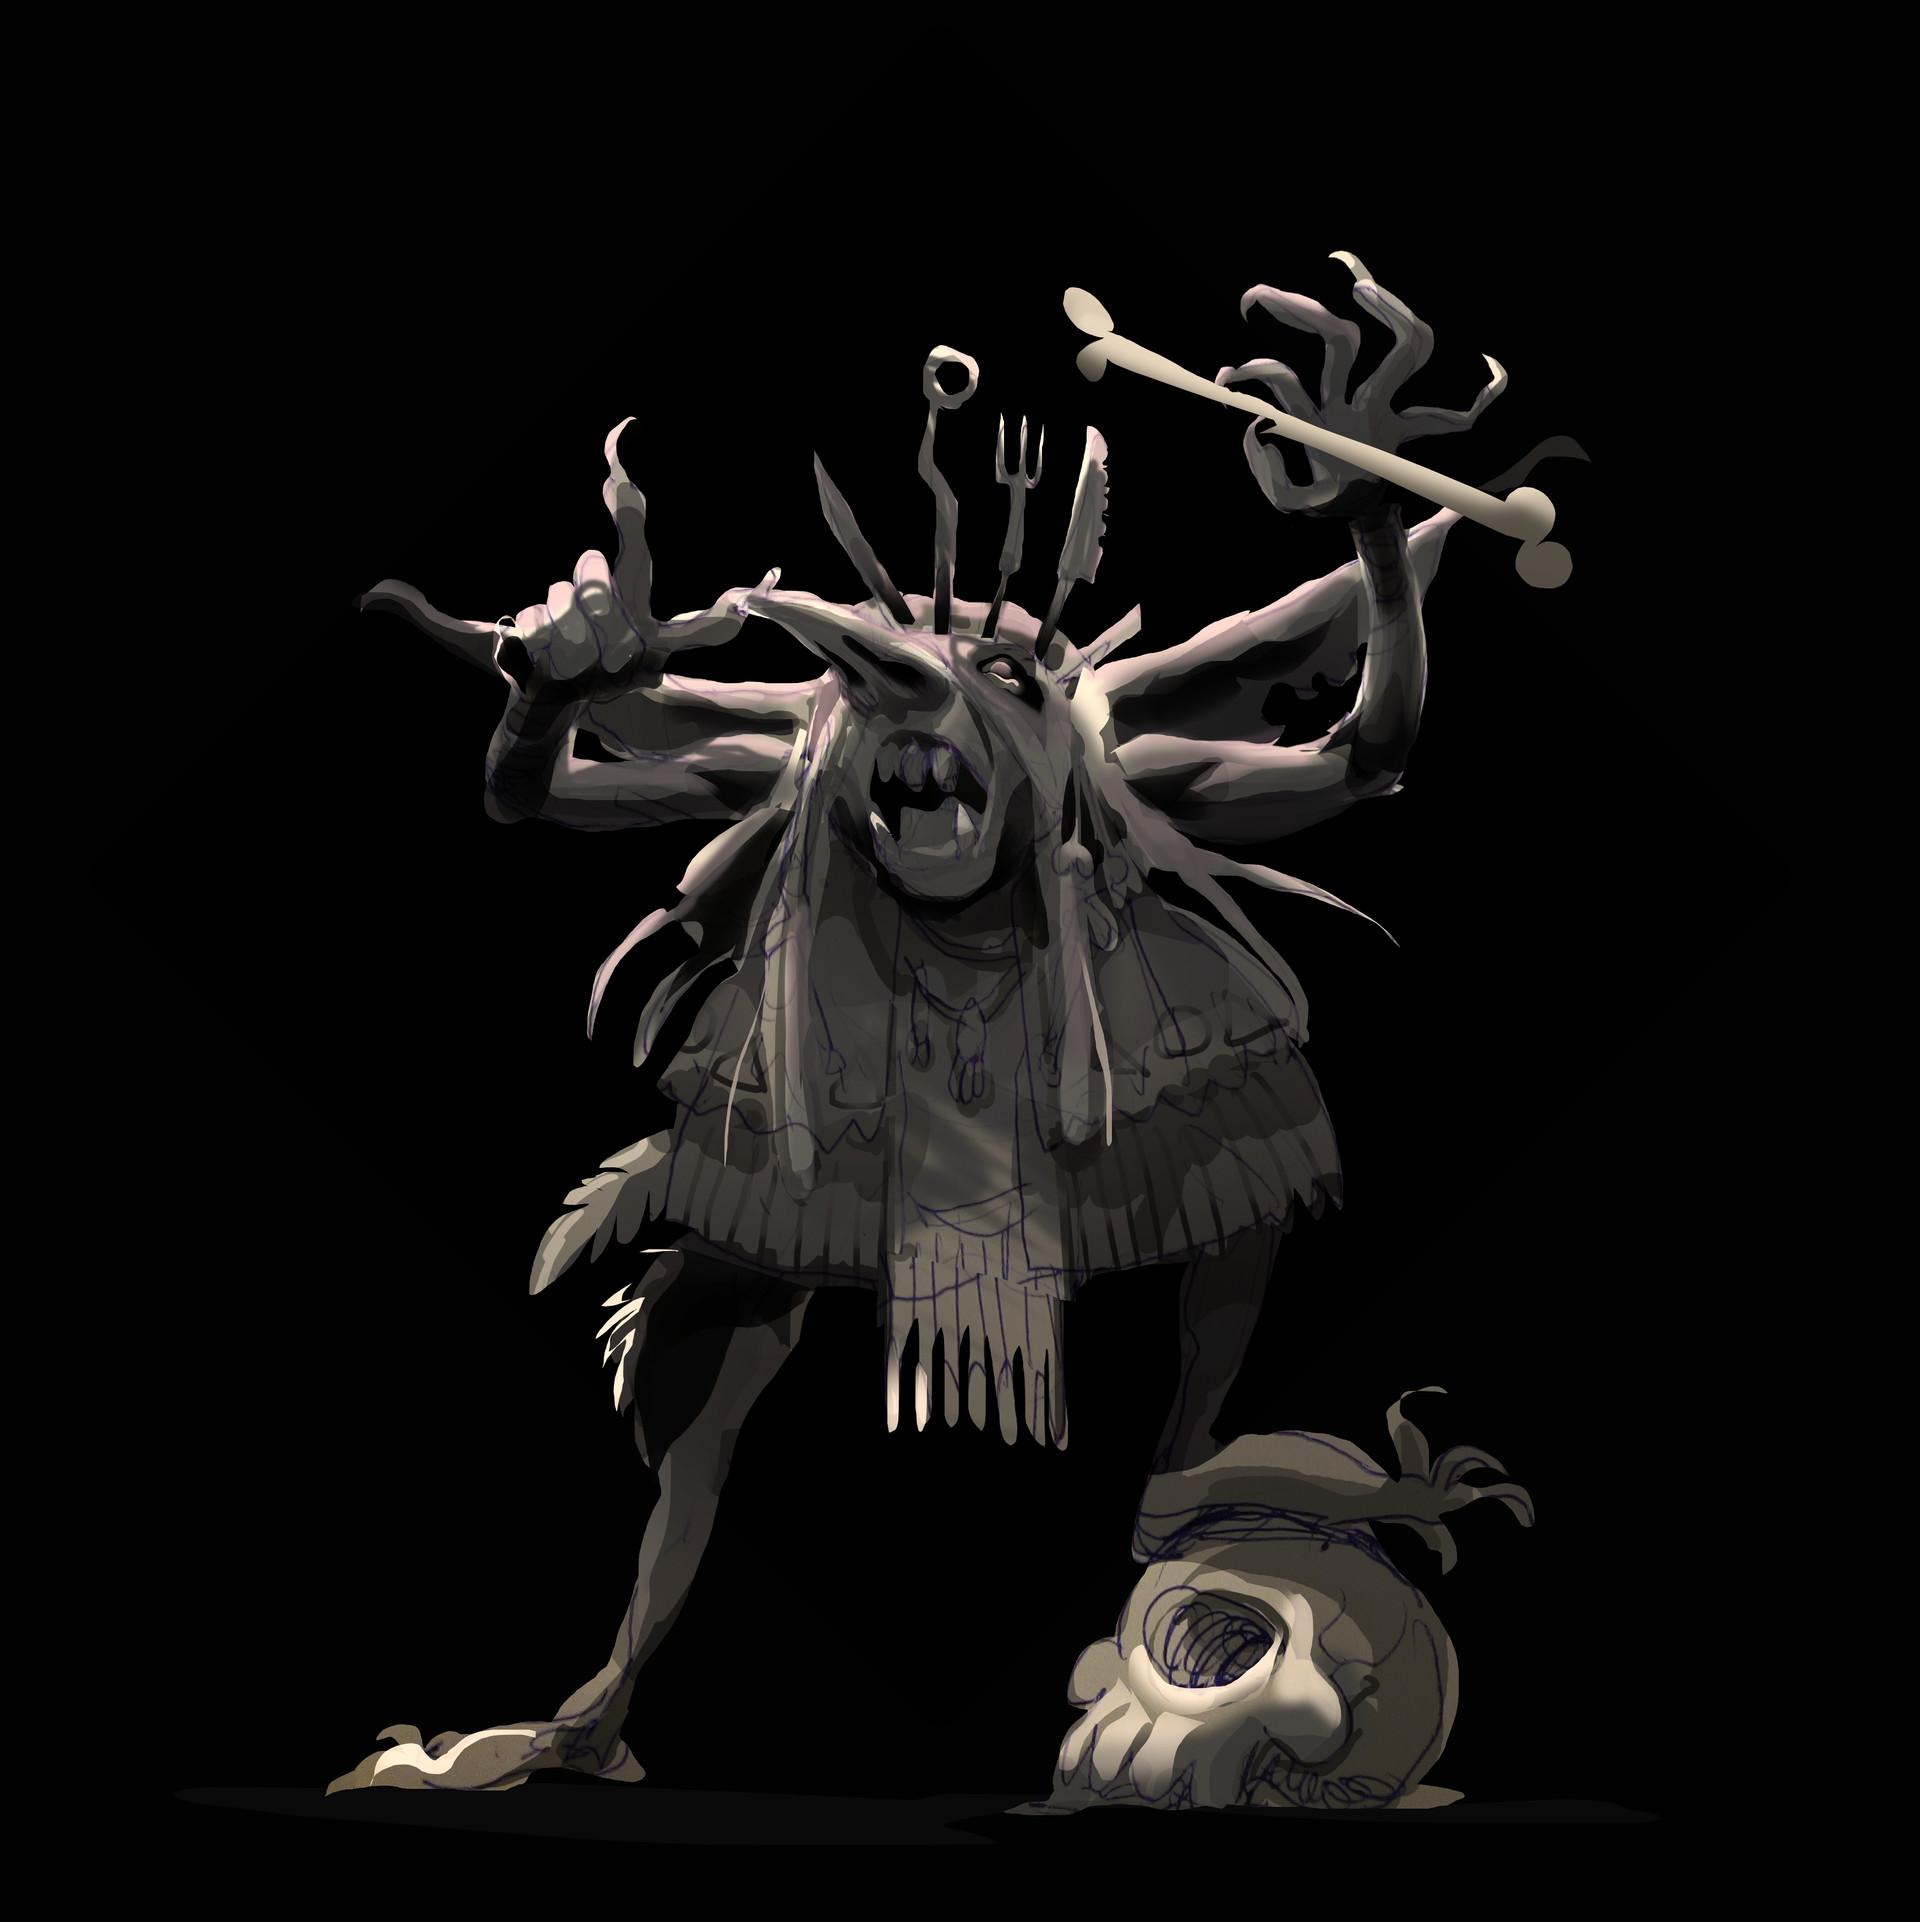 Fabian golz 13 shaman